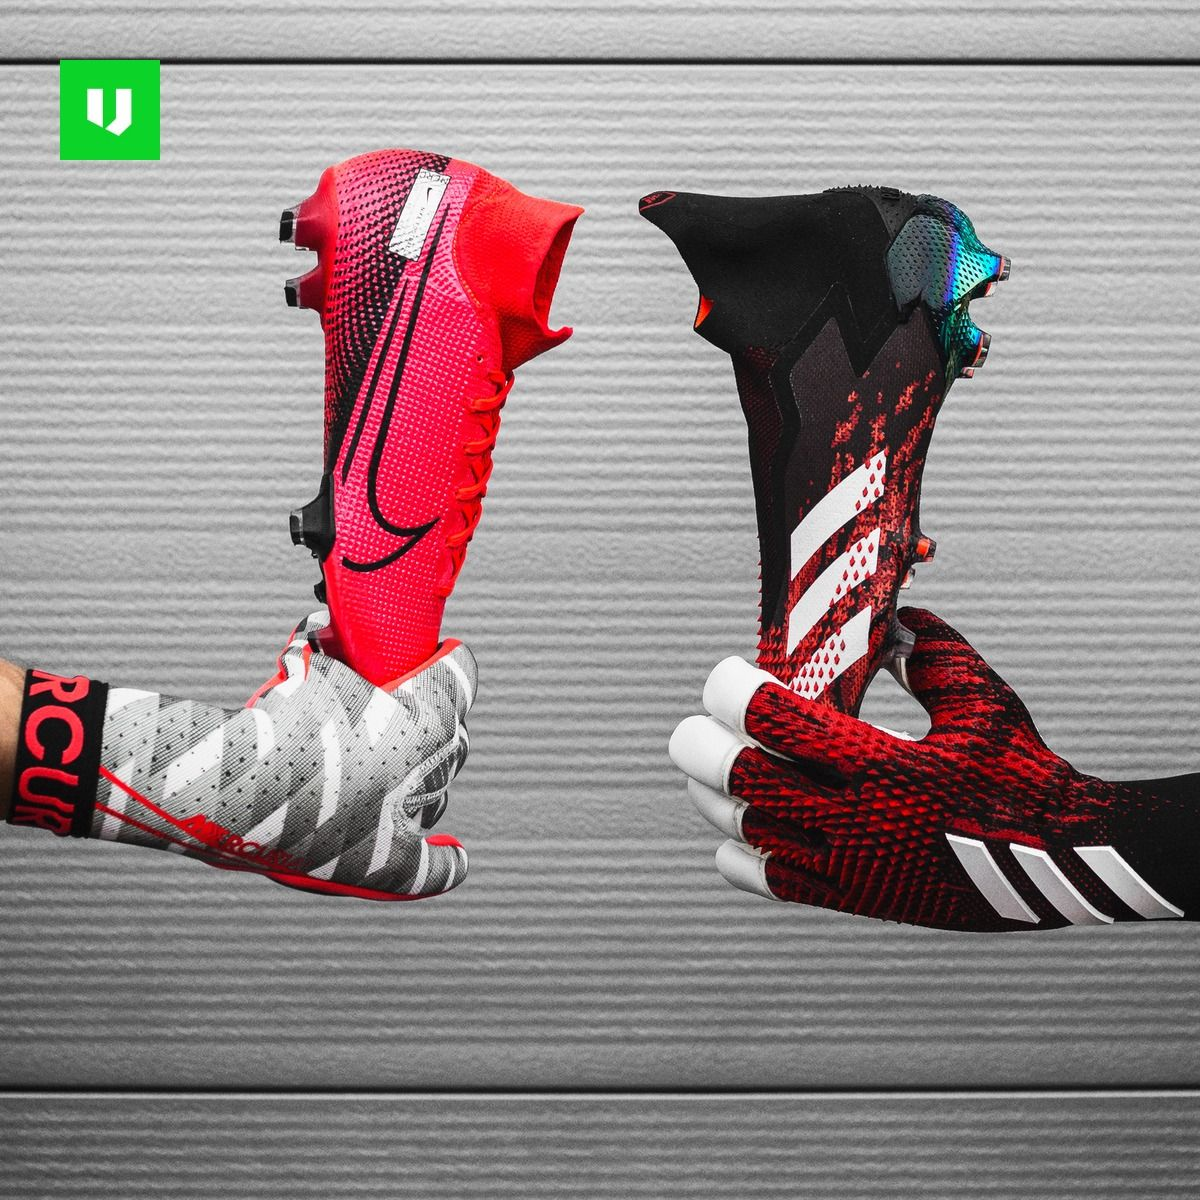 Adidas Vs Nike In 2020 Nike Football Boots Predator Football Boots Football Boots